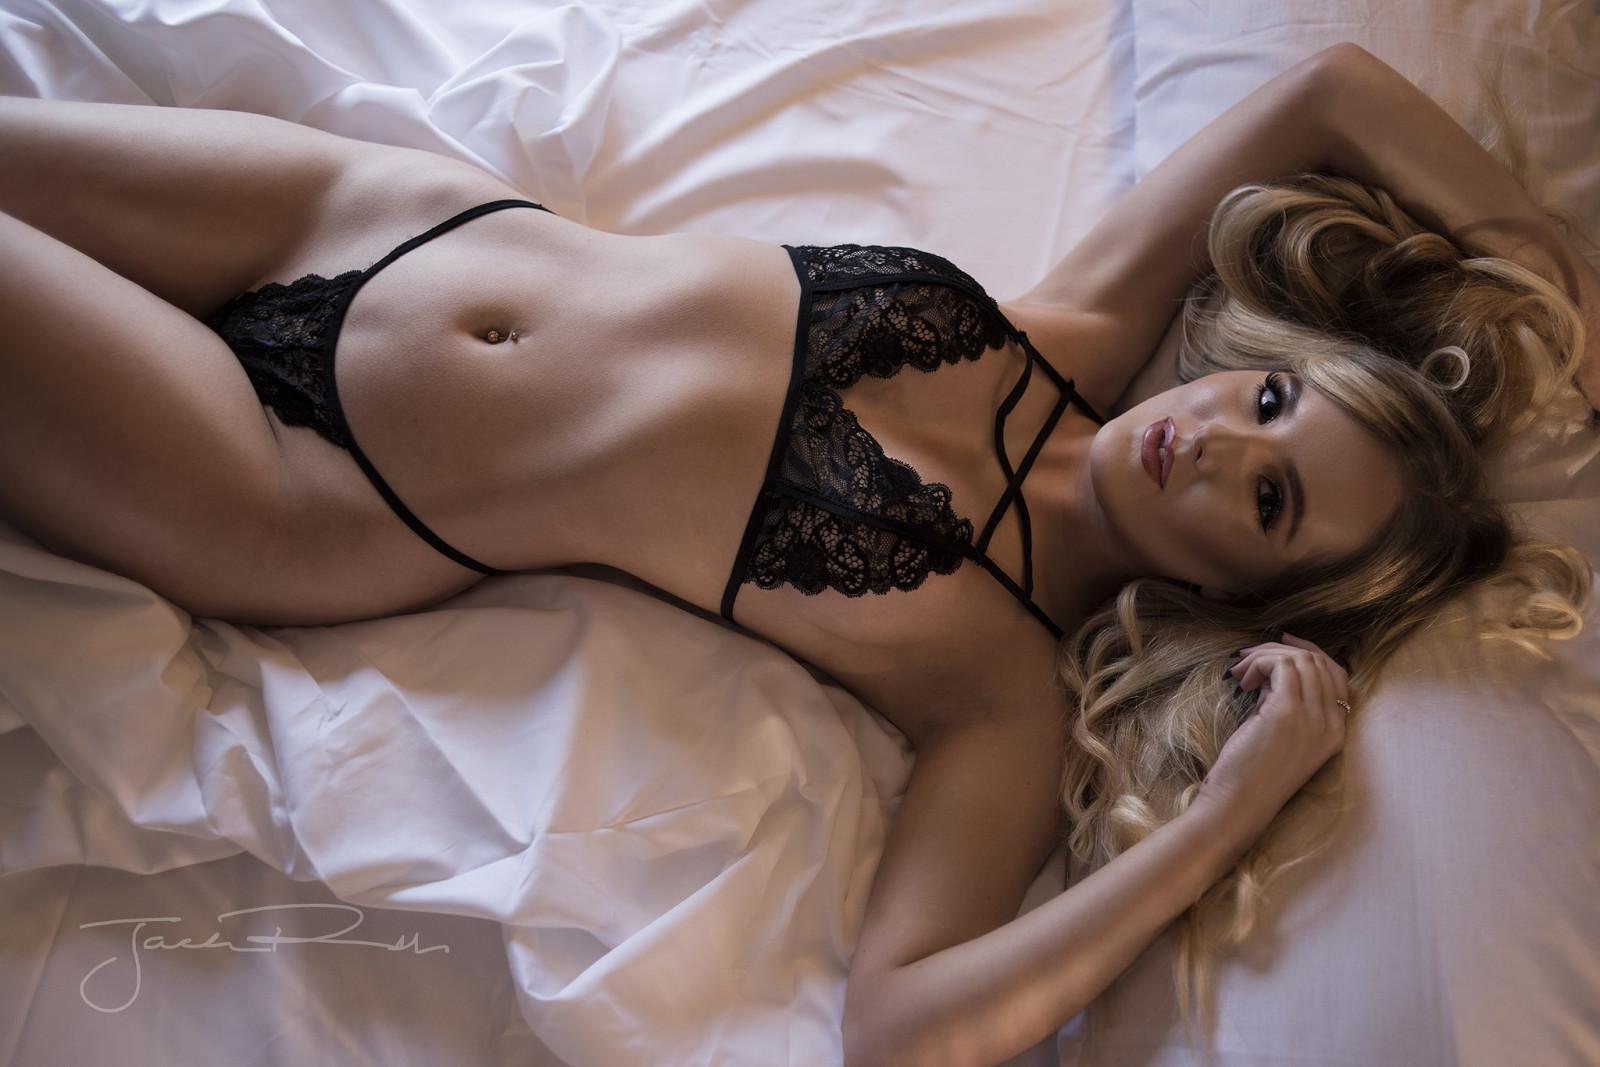 Фото красивого секса в белье, супер чулки порно